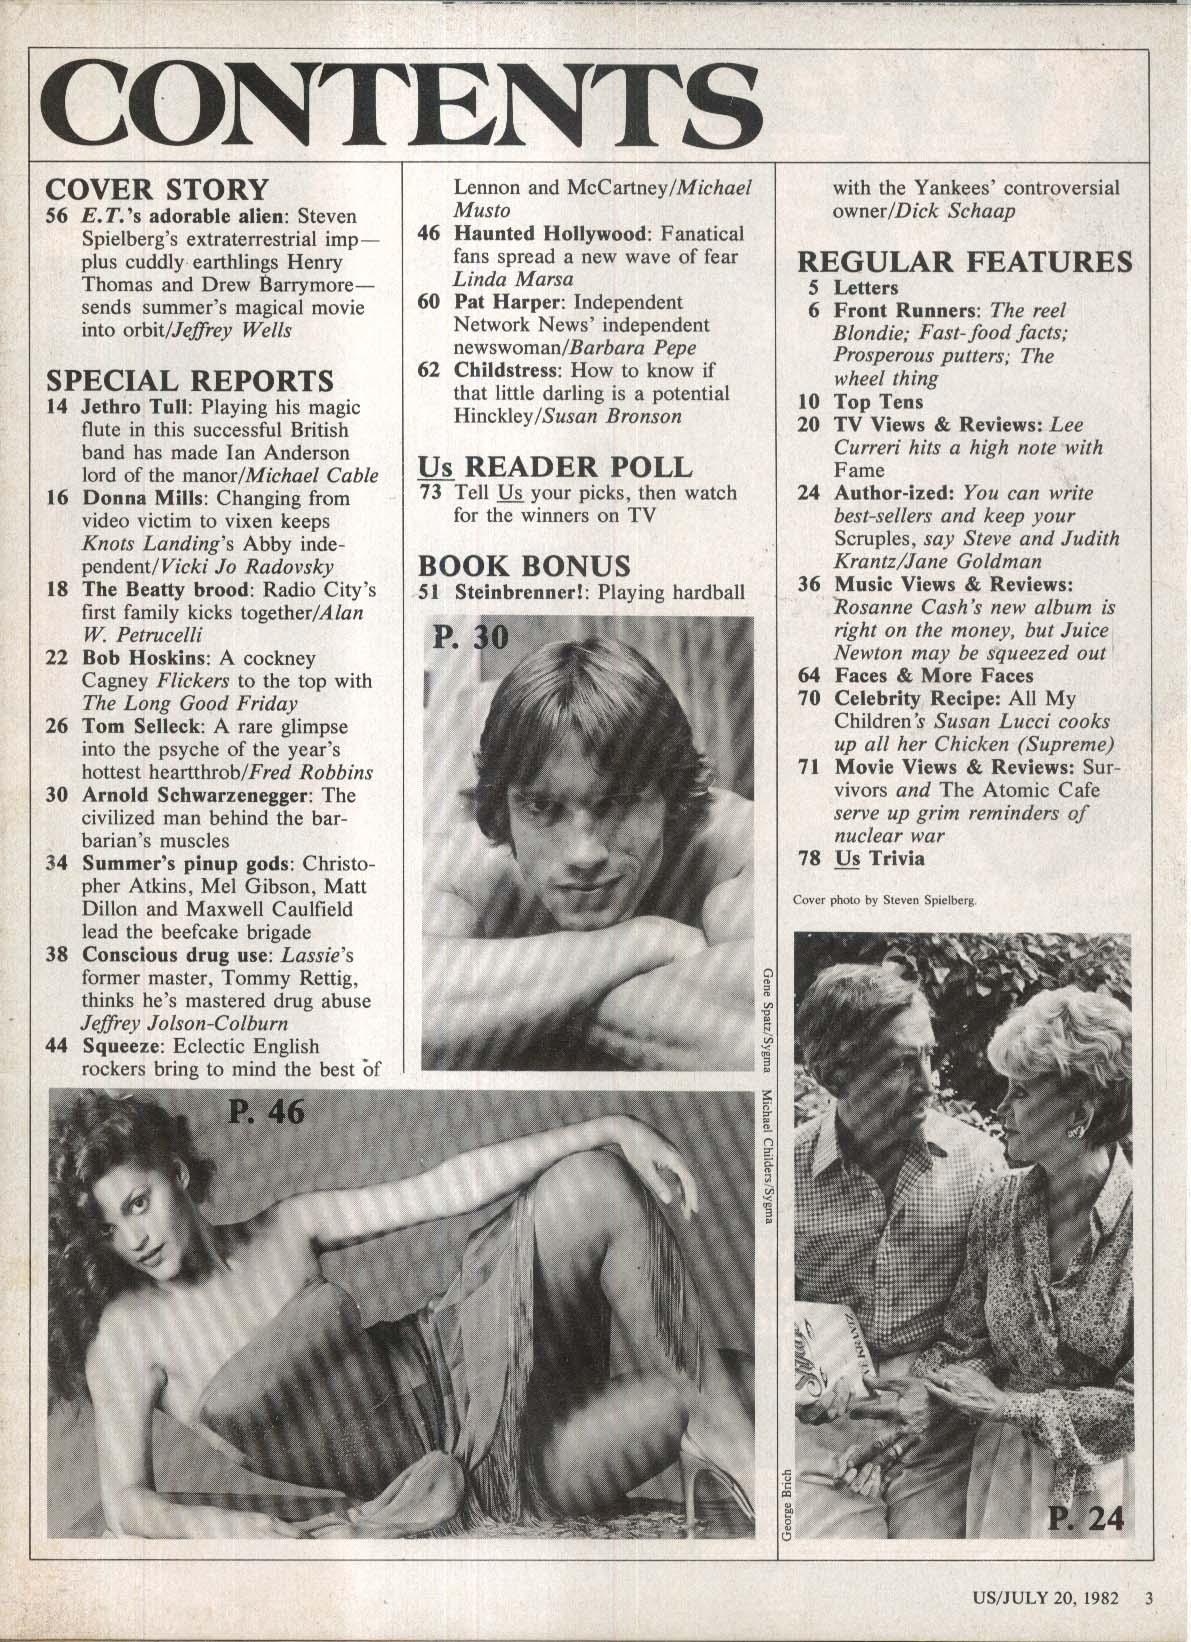 US ET Extraterrestrial Tom Selleck George Steinbrenner stalkers ++ 7/20 1982